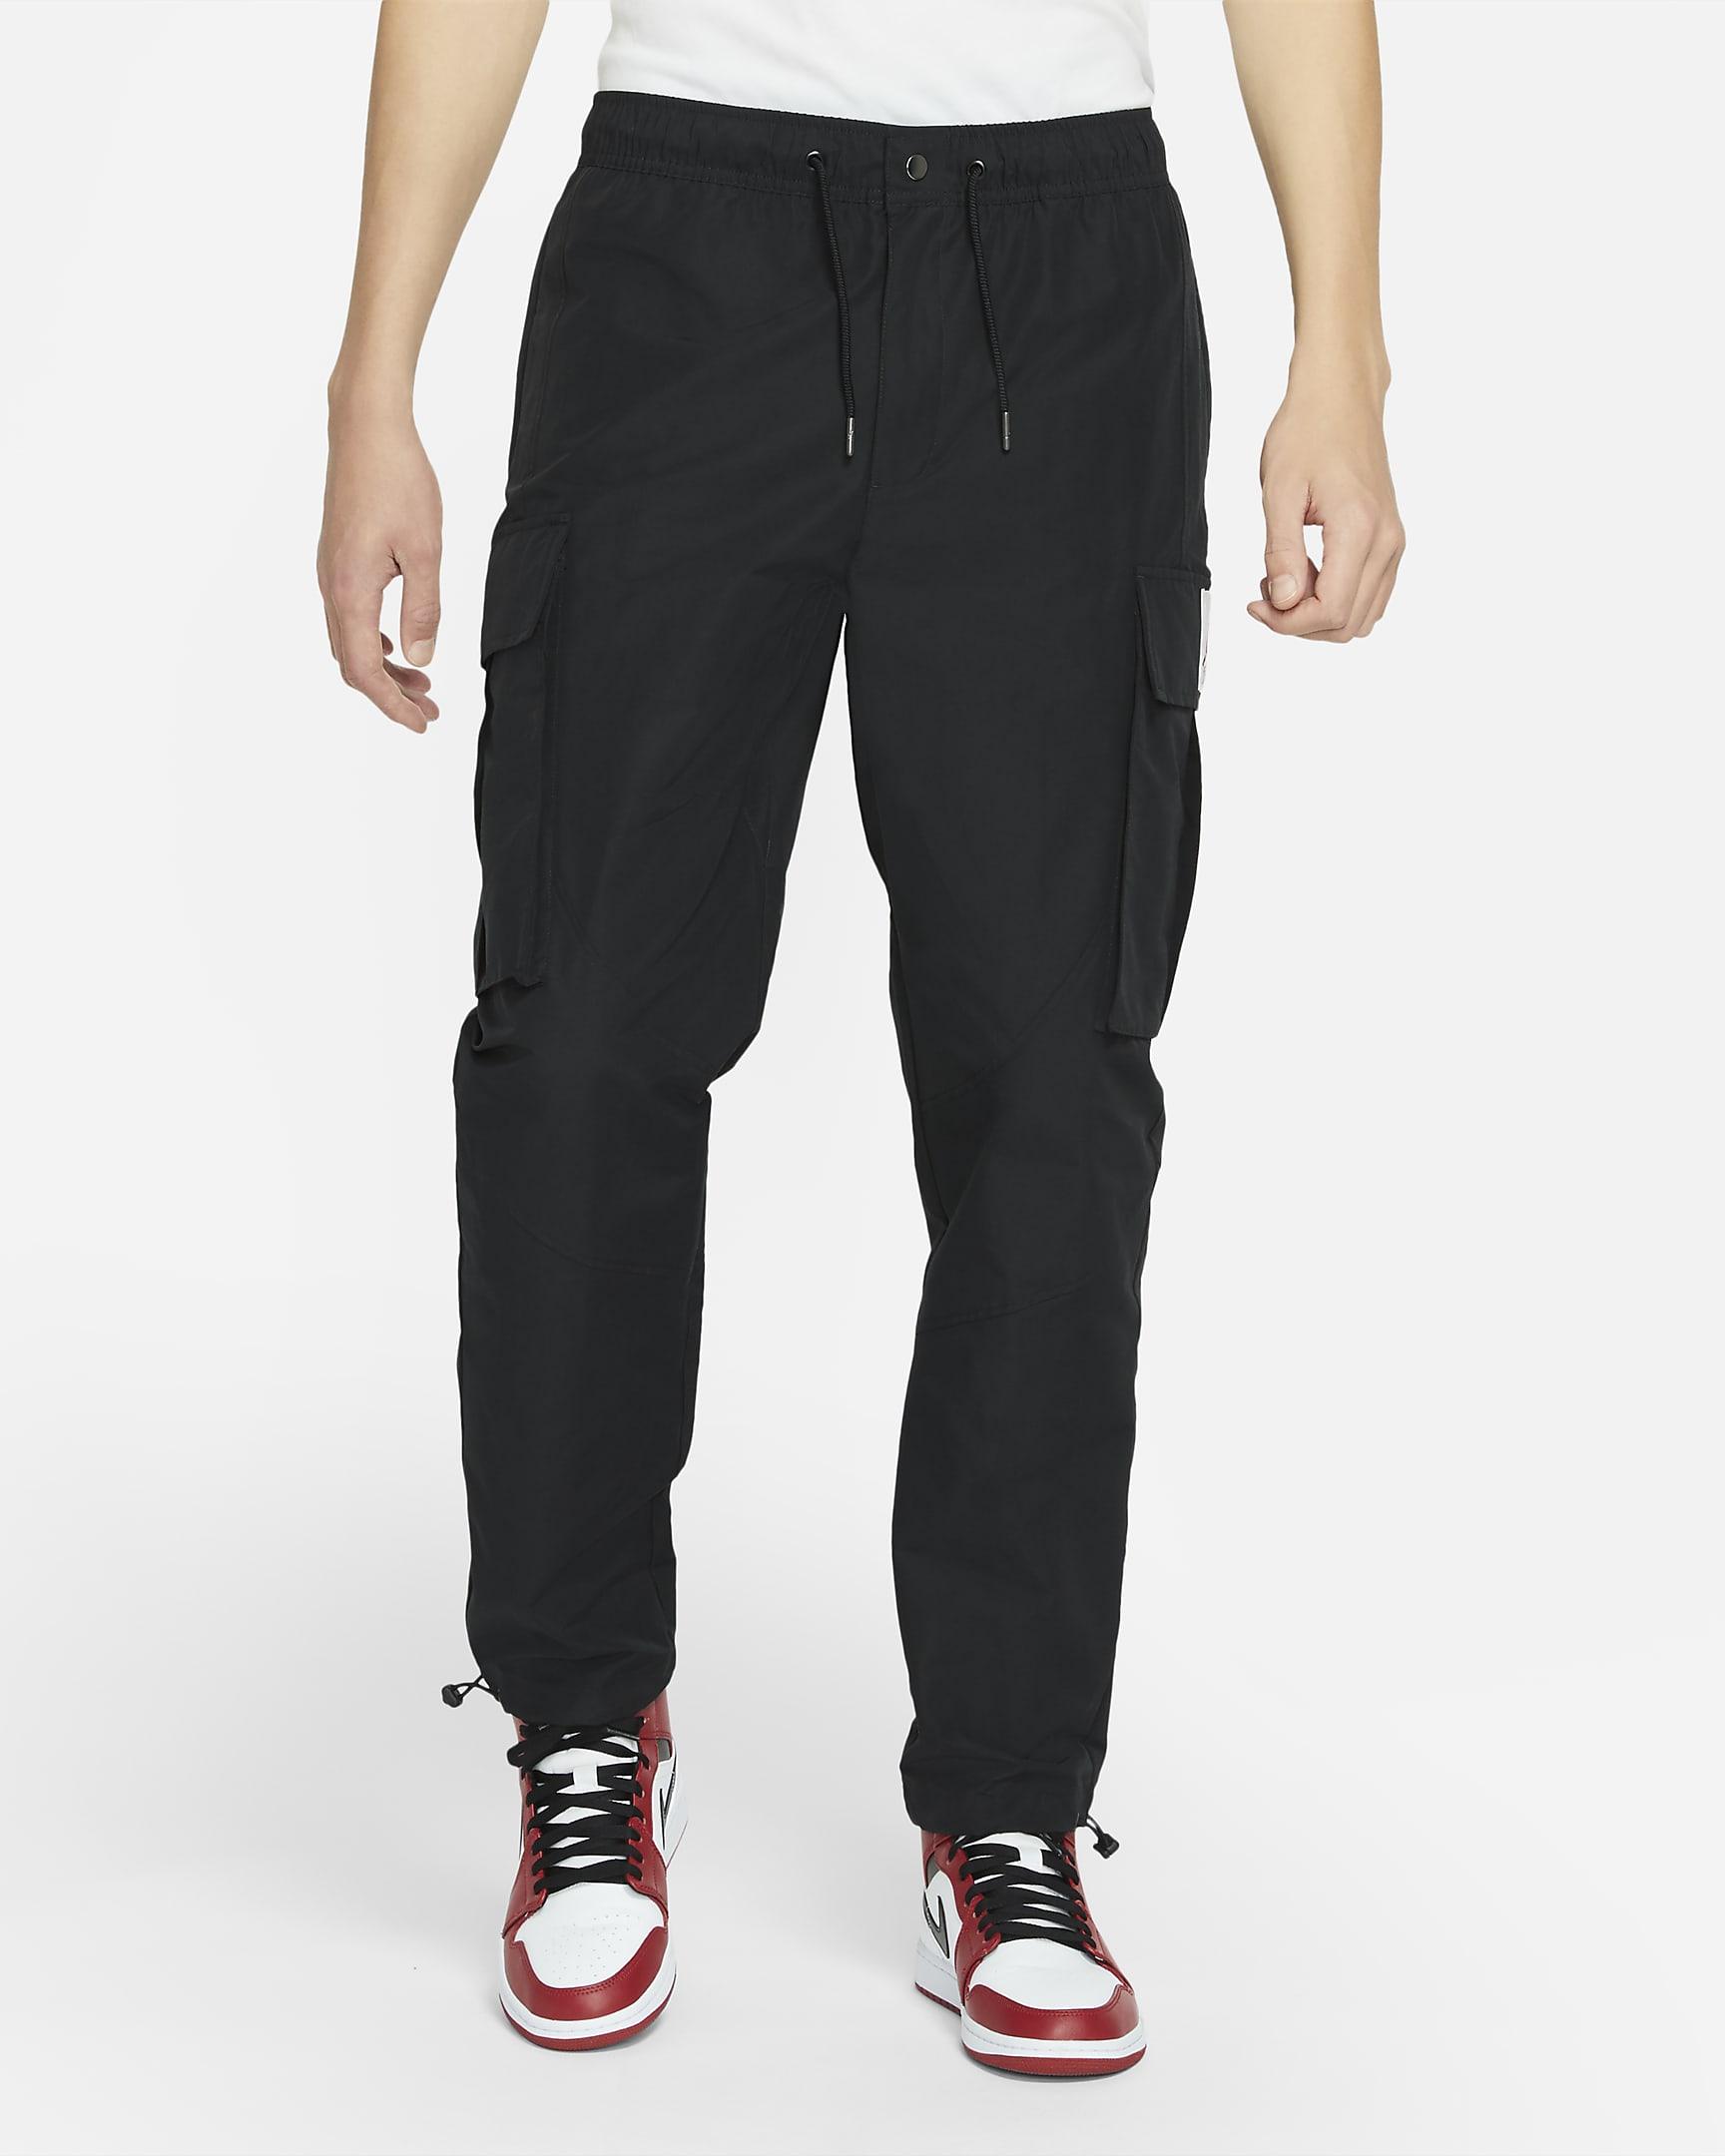 jordan-flight-mens-woven-pants-plT7Sv